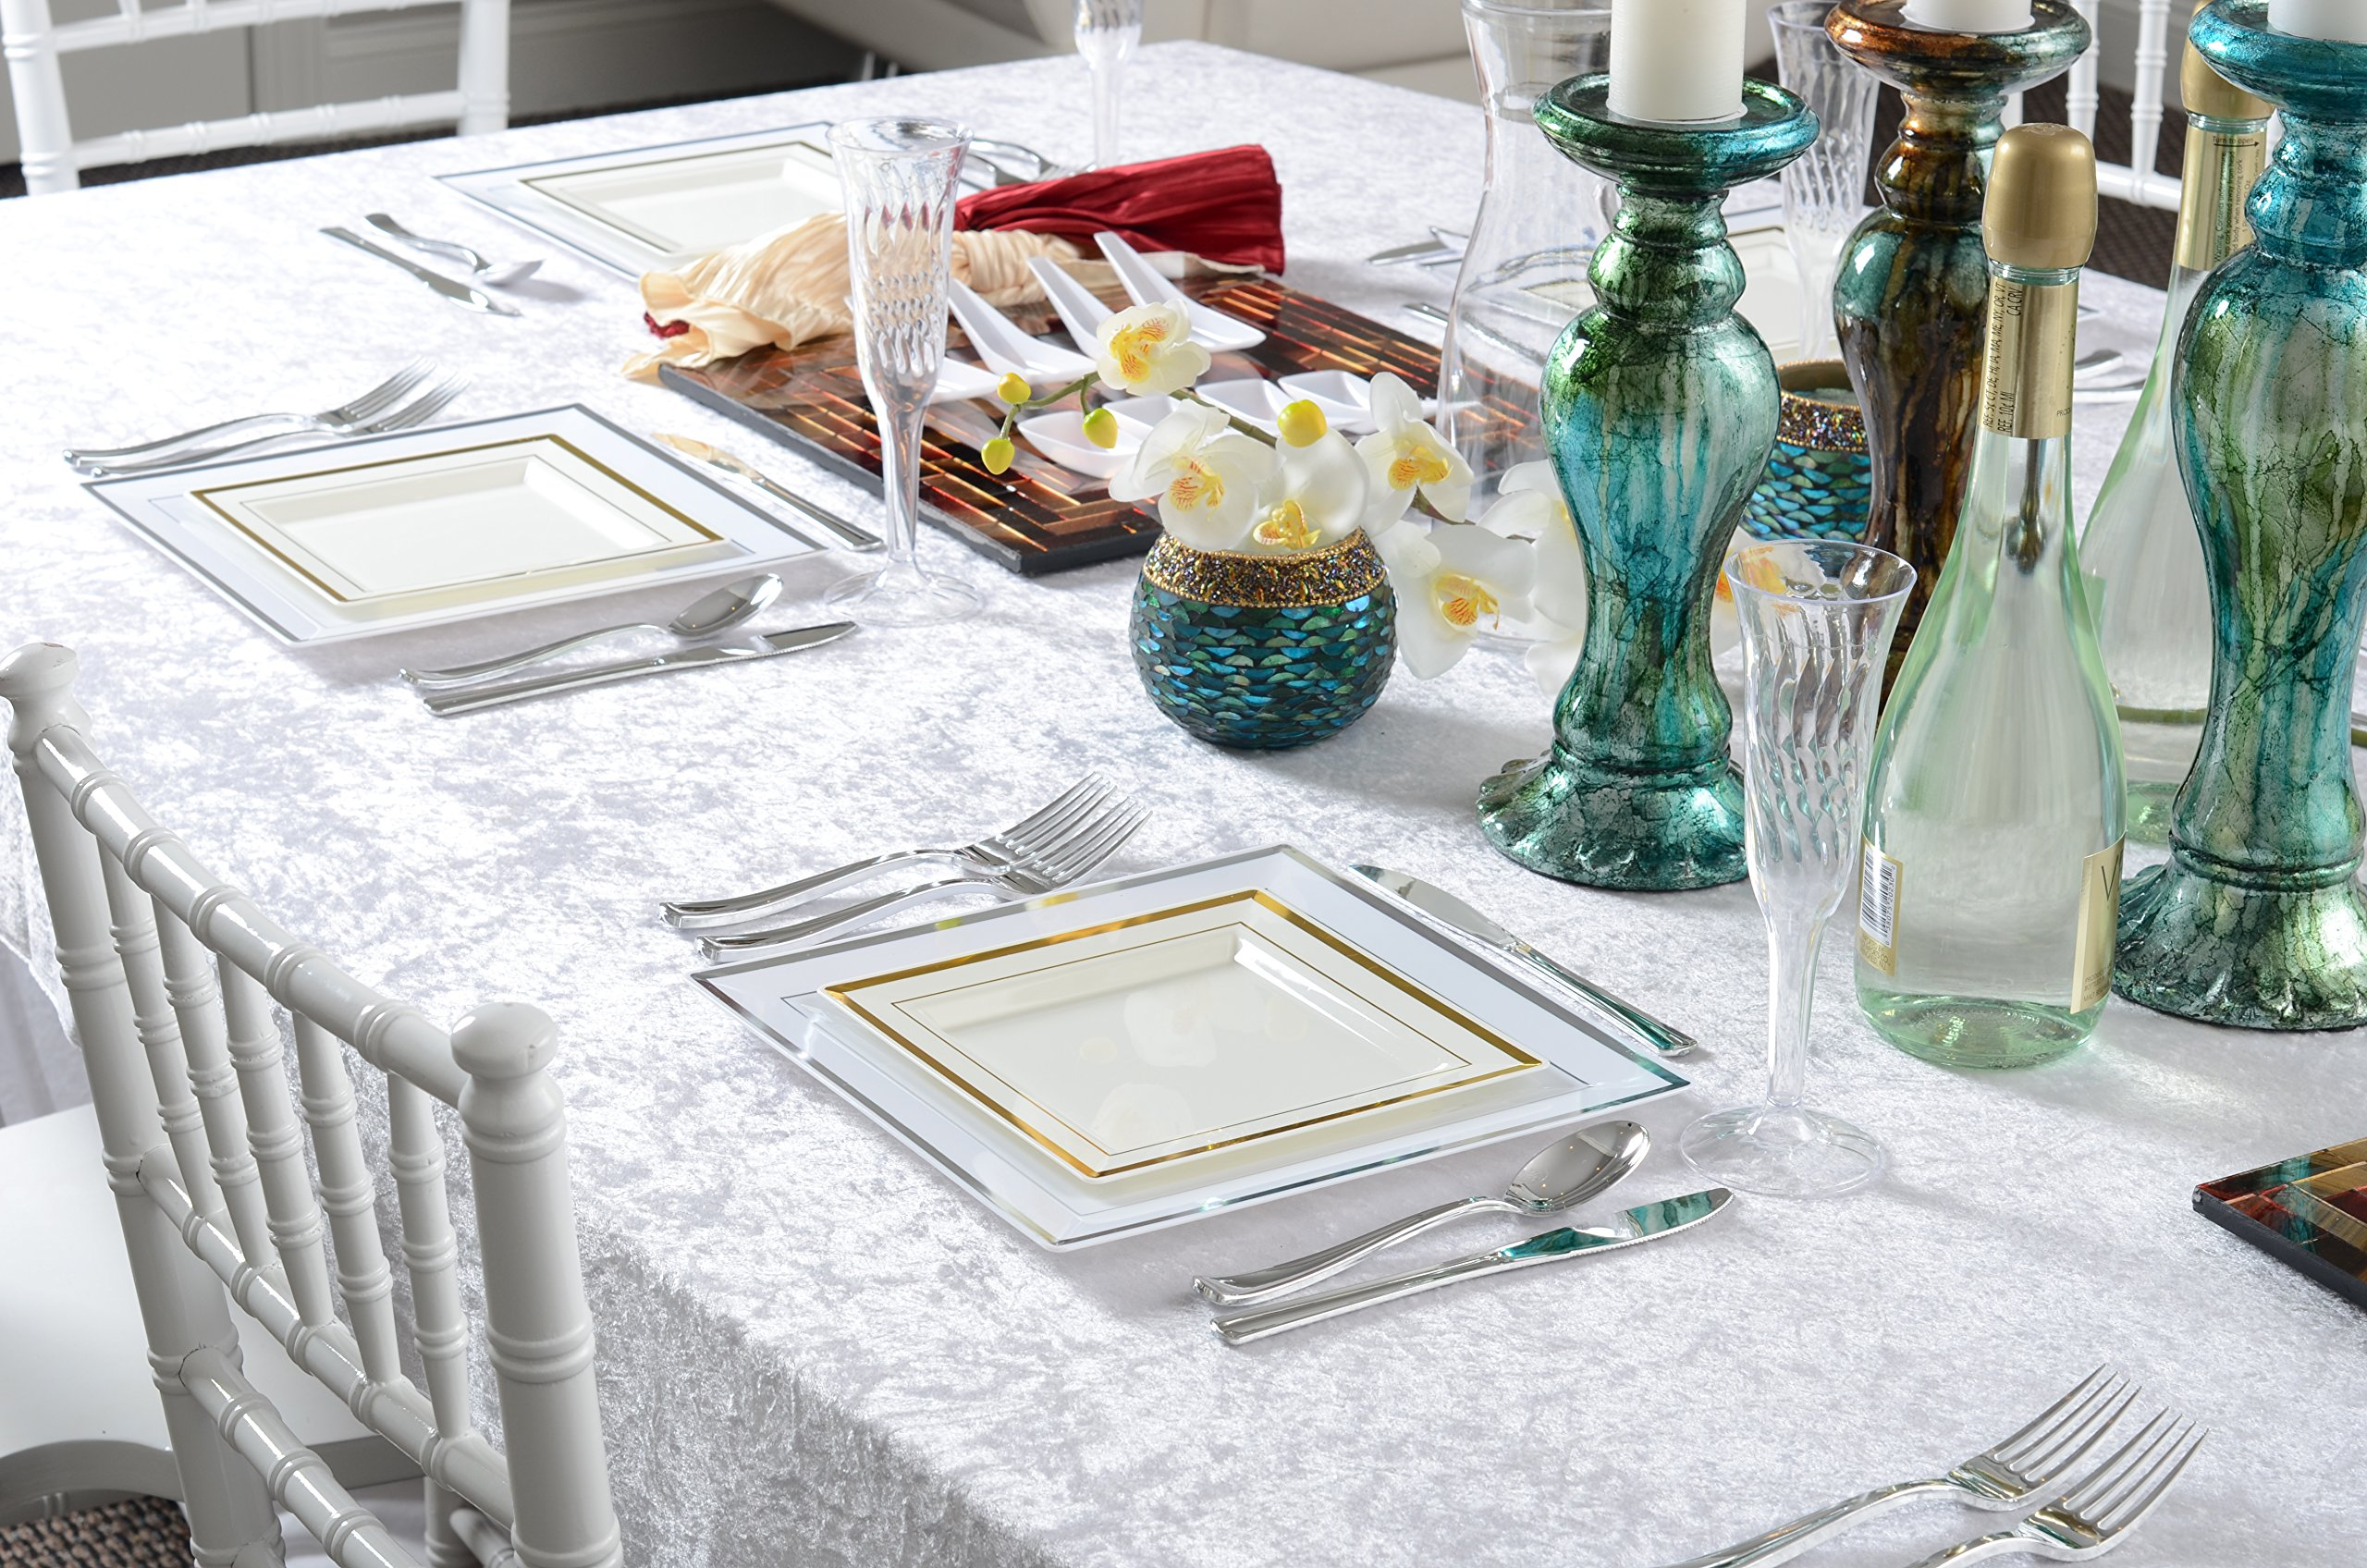 Square Splendor 5507-WH Trim Square Dessert Plate, 7.25-Inch, White and Silver, Pack of 120 by Square Splendor (Image #3)